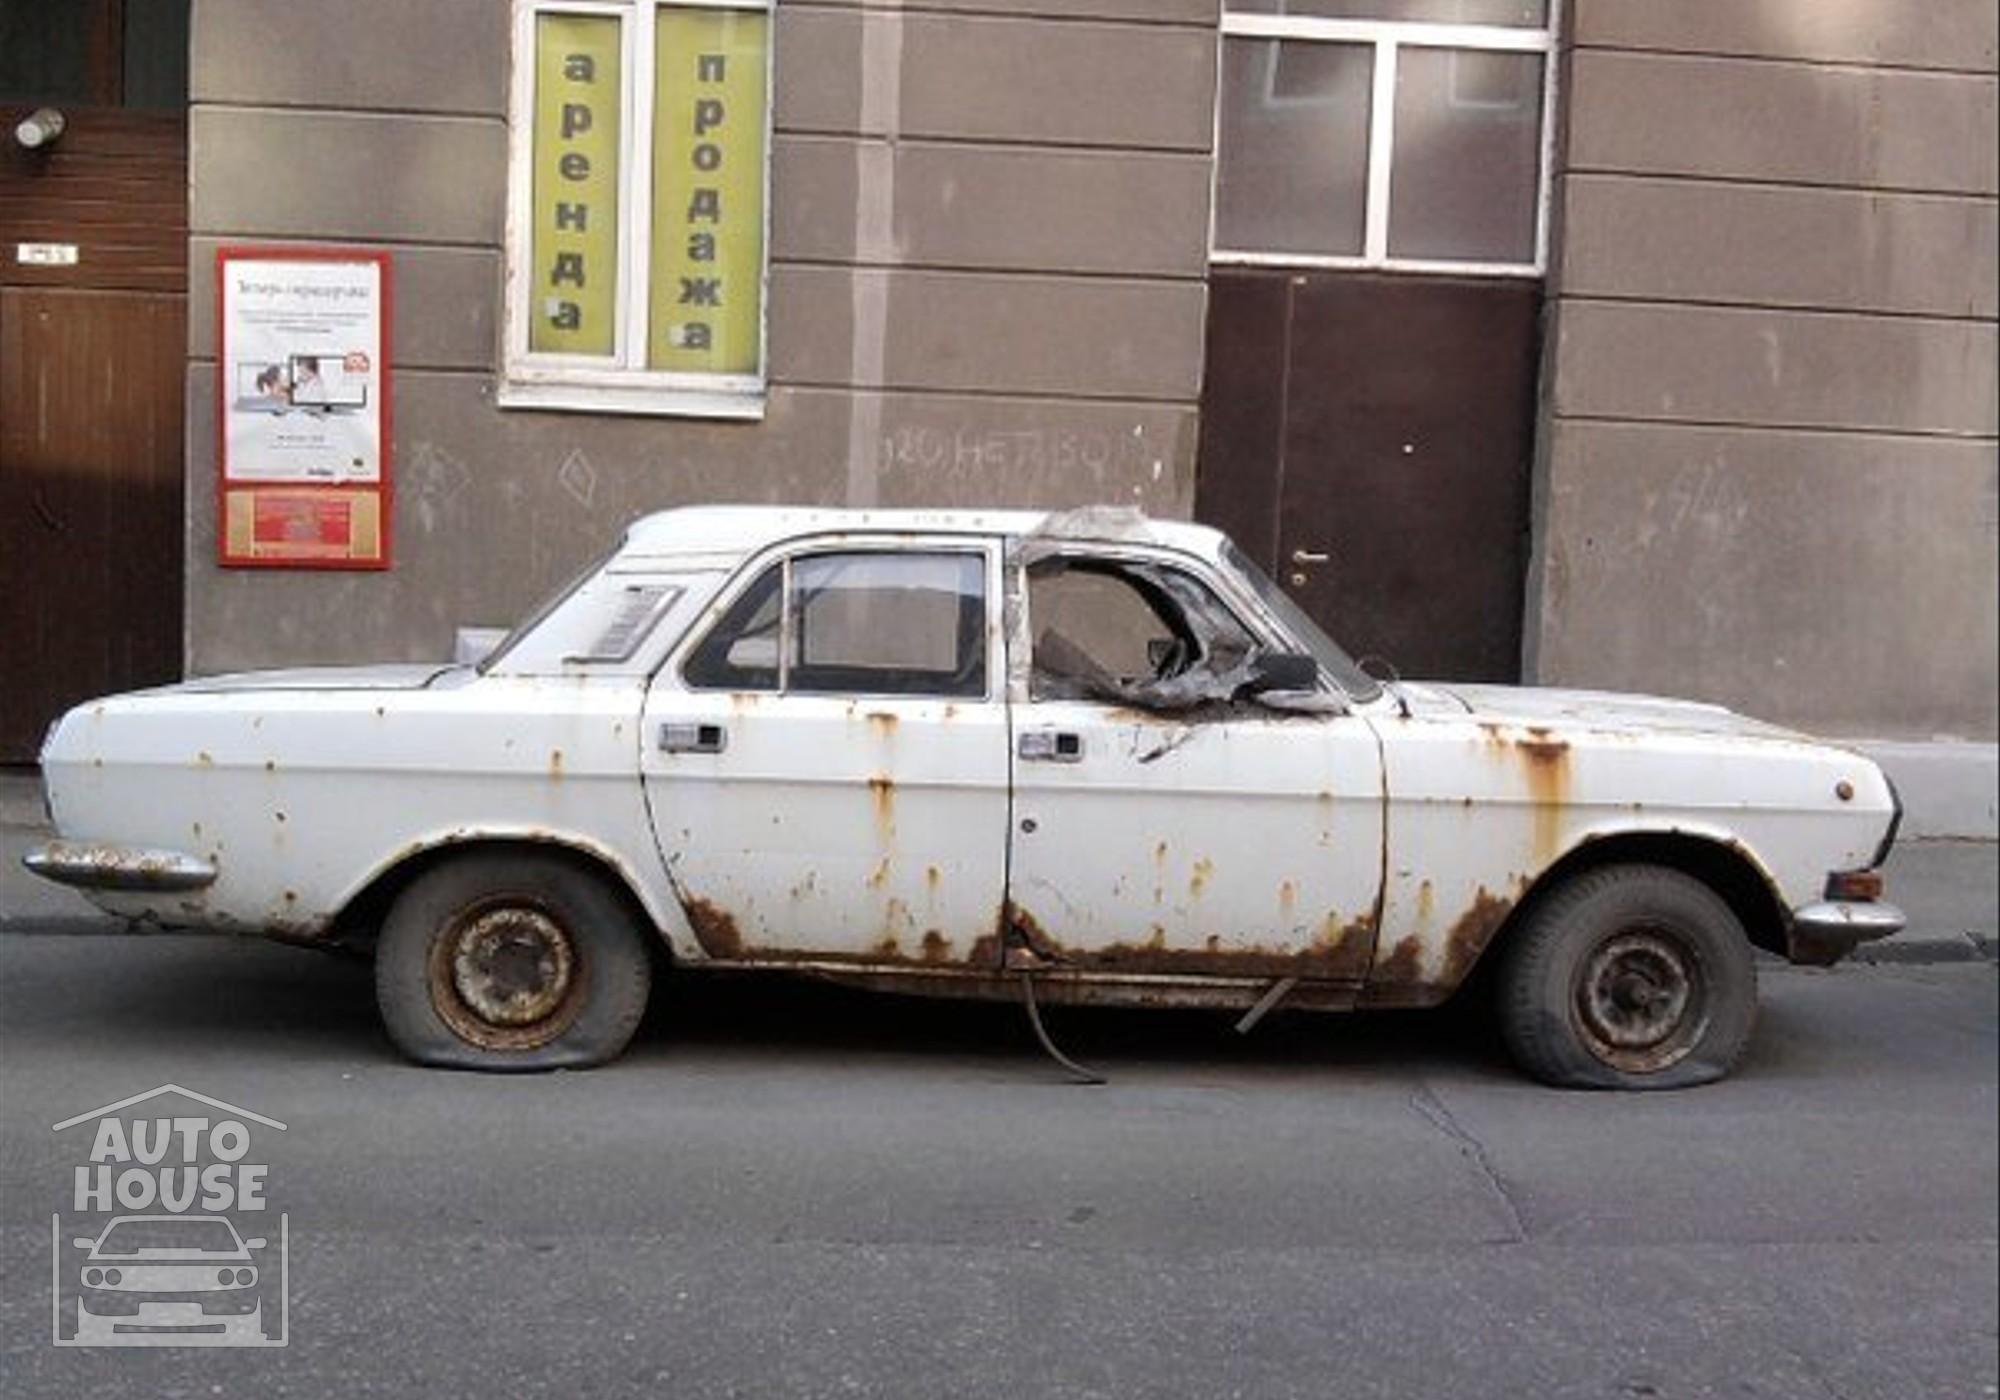 ГАЗ 3110 1998 г. в разборе